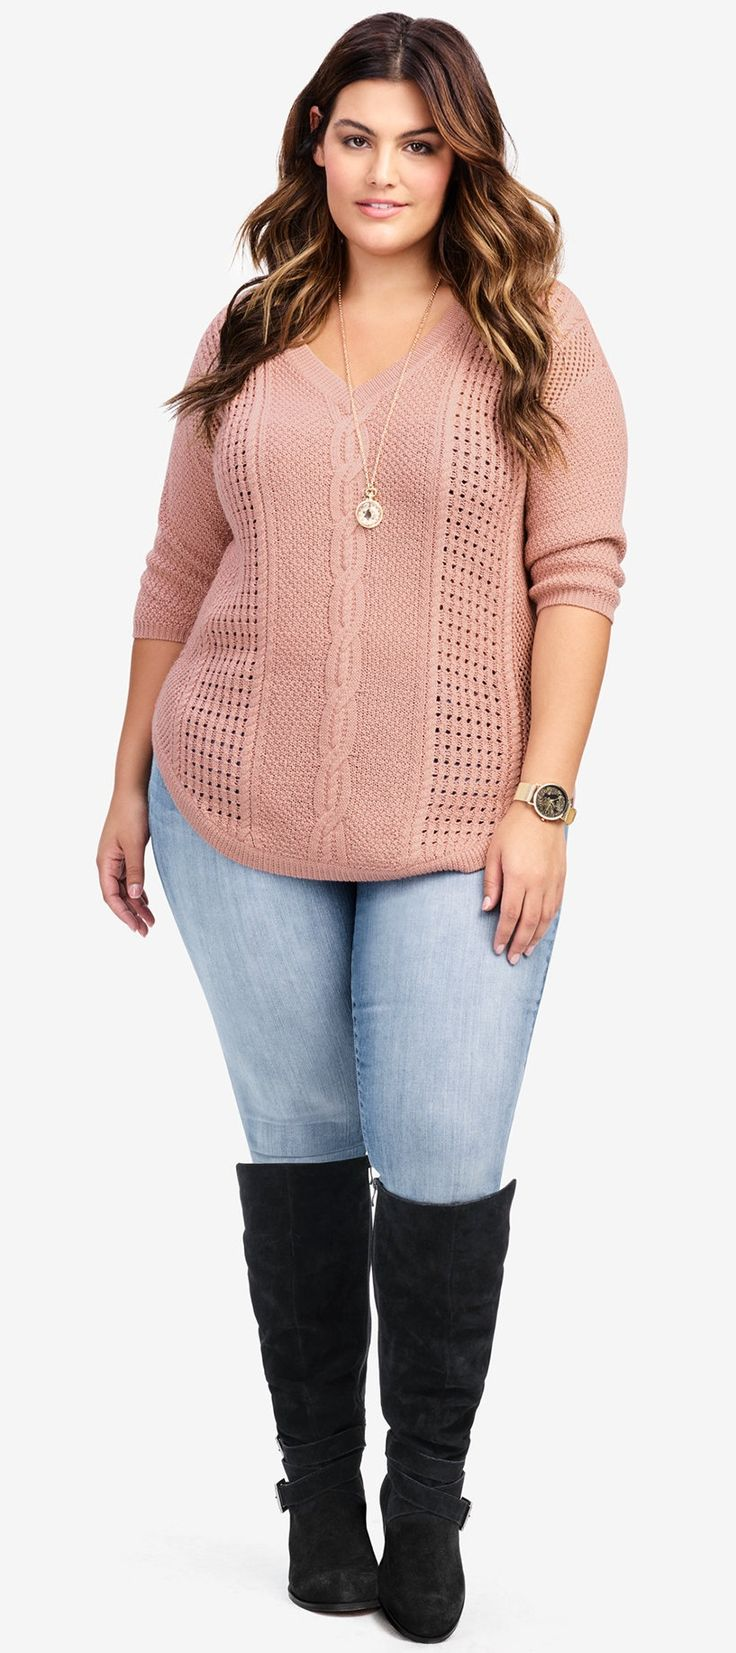 Plus Size Fall Sweater #plussize